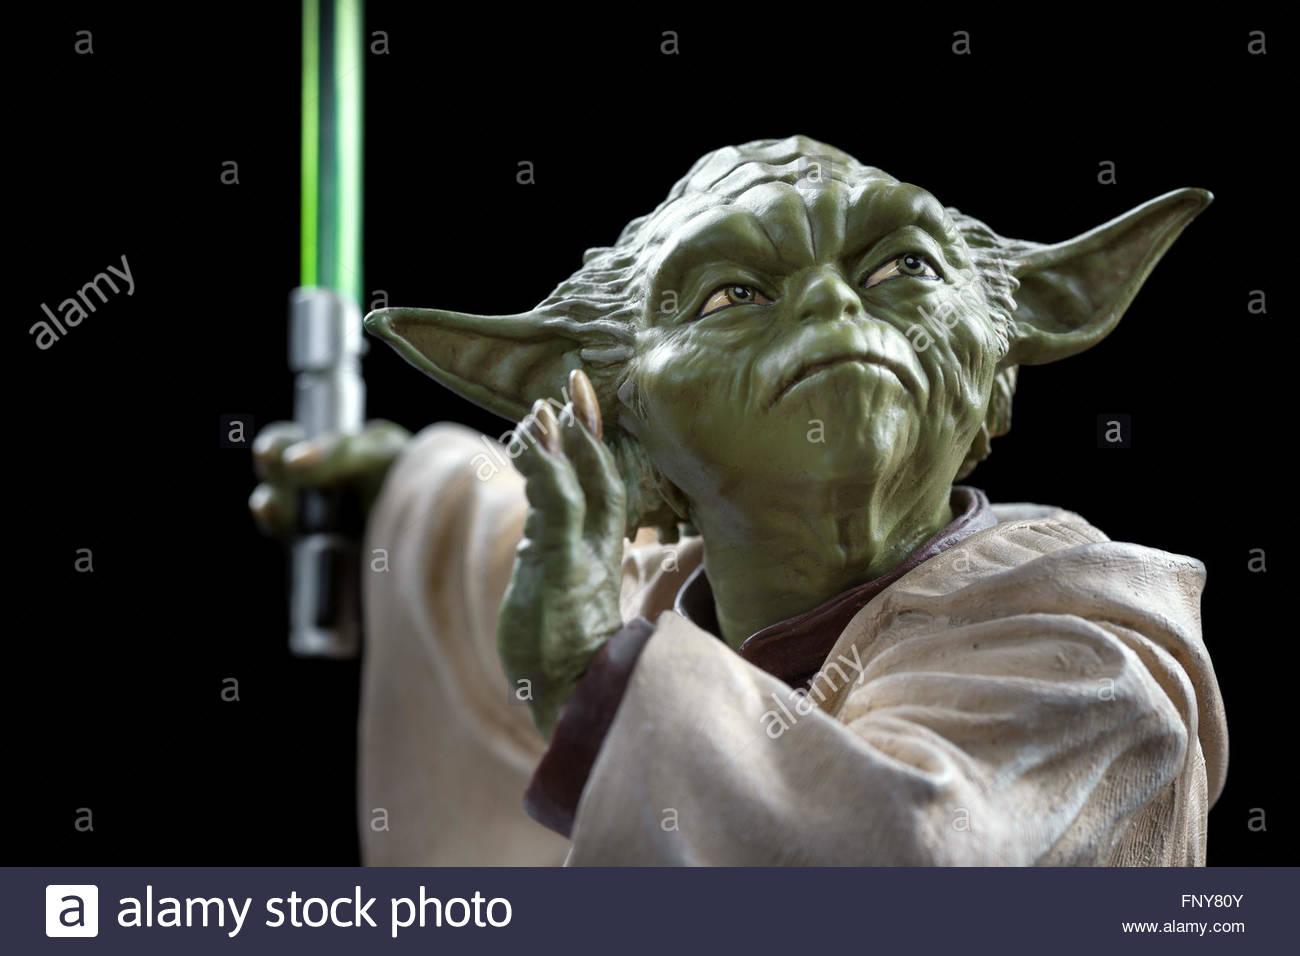 star-wars-yoda-jedi-master-limited-editi